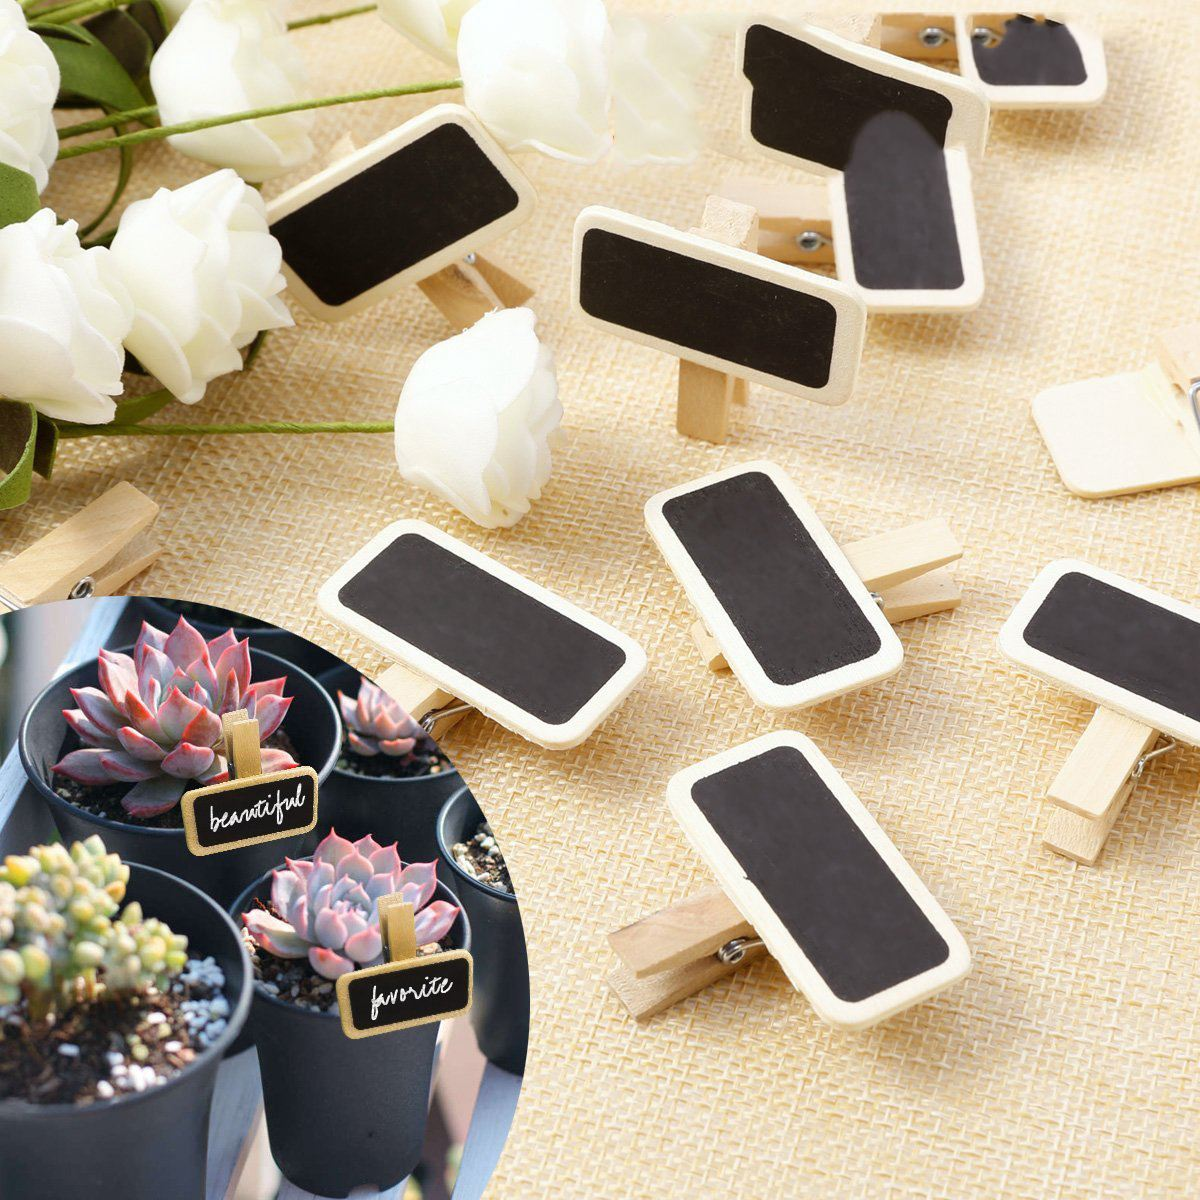 Gran oferta 50 Mini pizarra de madera para mensajes pizarra clip rectangular clip panel tarjeta etiqueta para notas marca precio lugar número Mesa